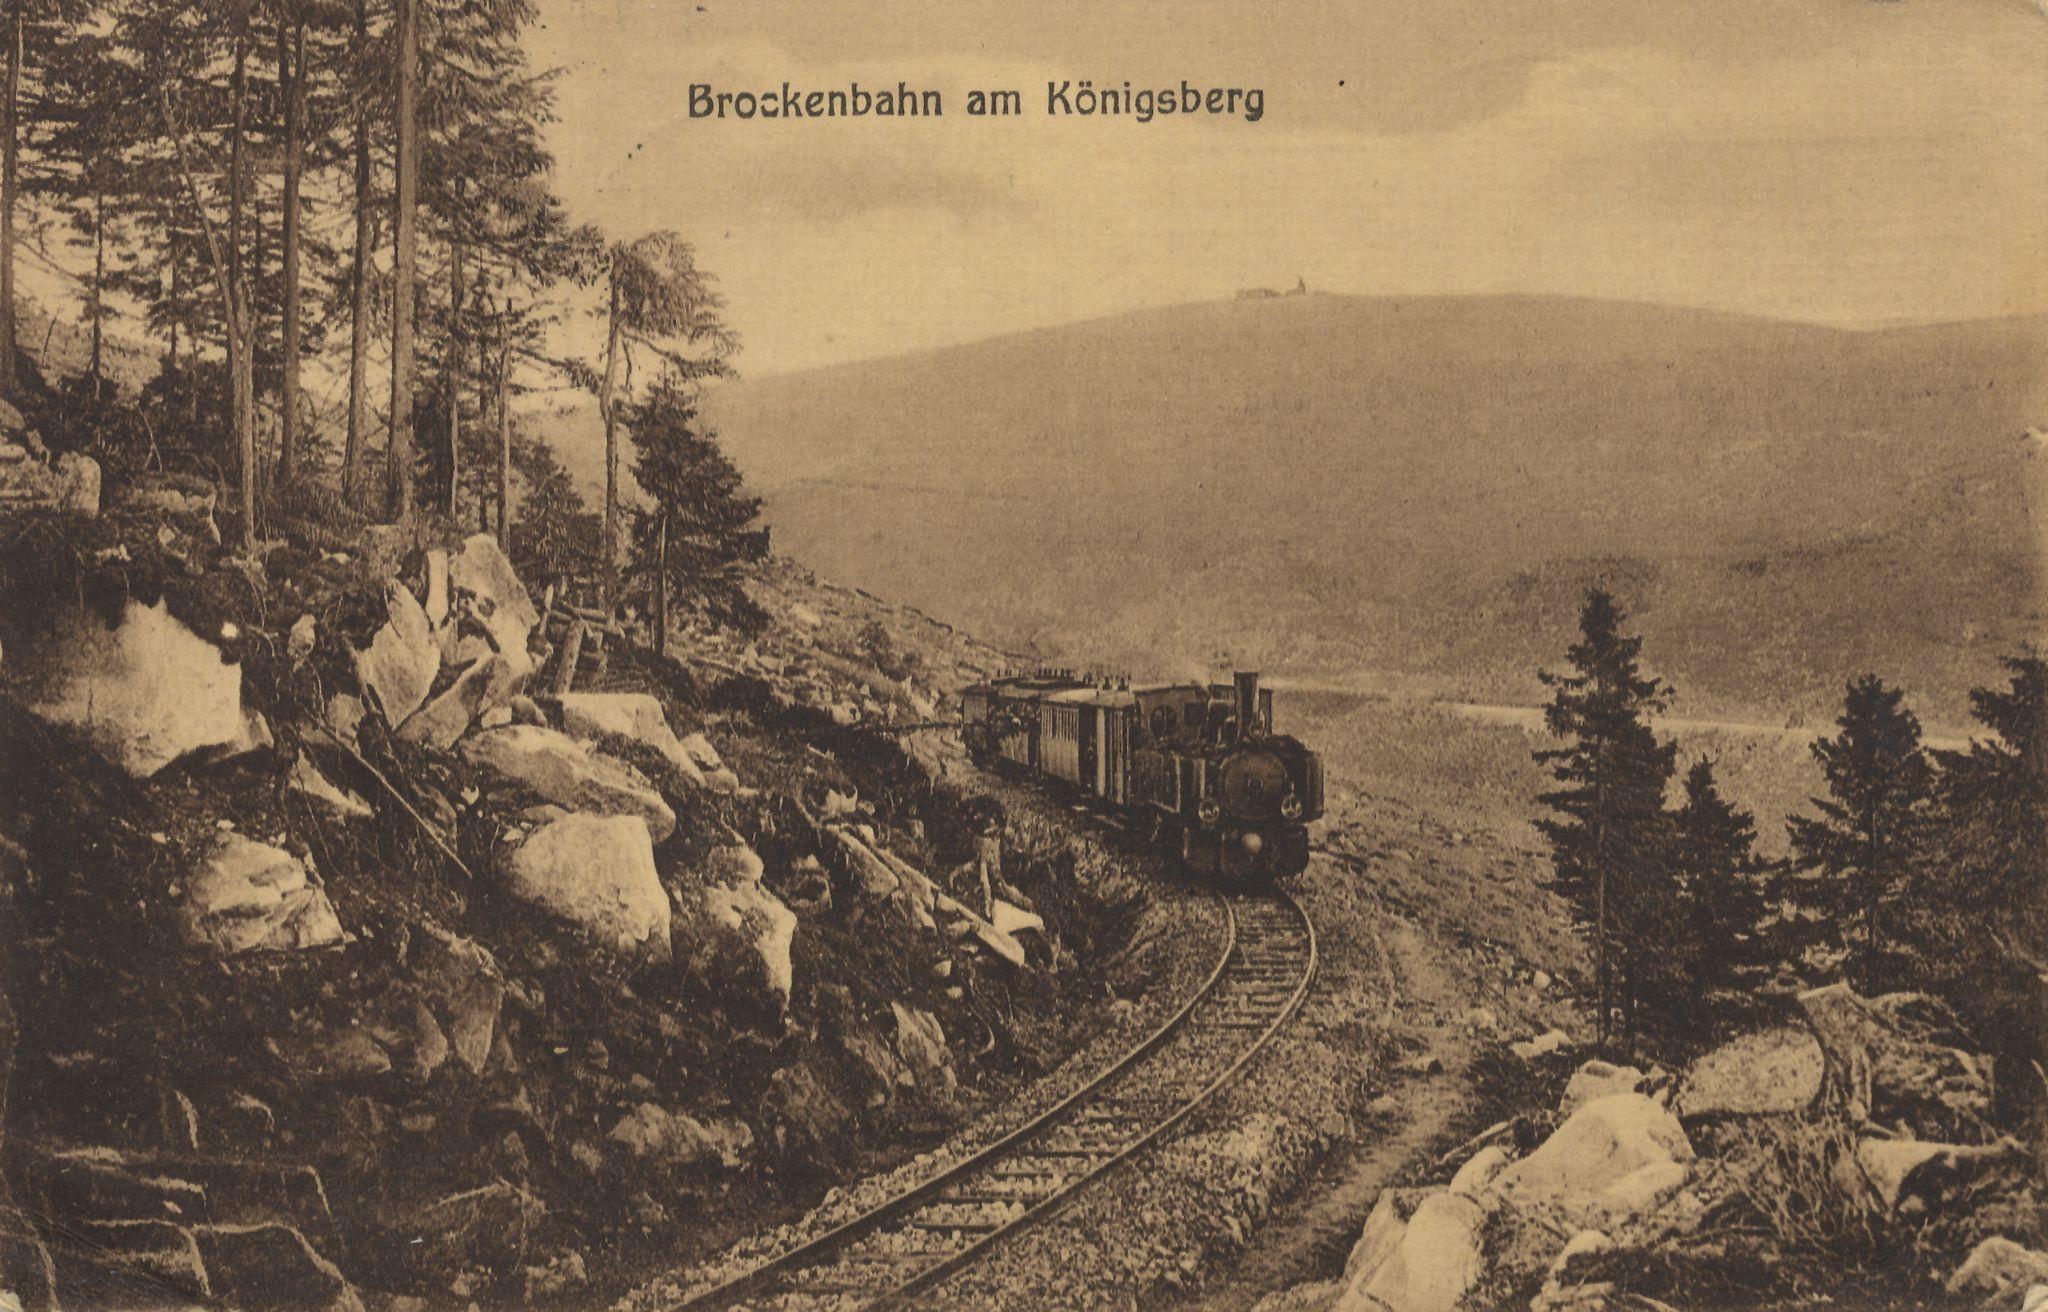 Brockenbahn en el Königsberg